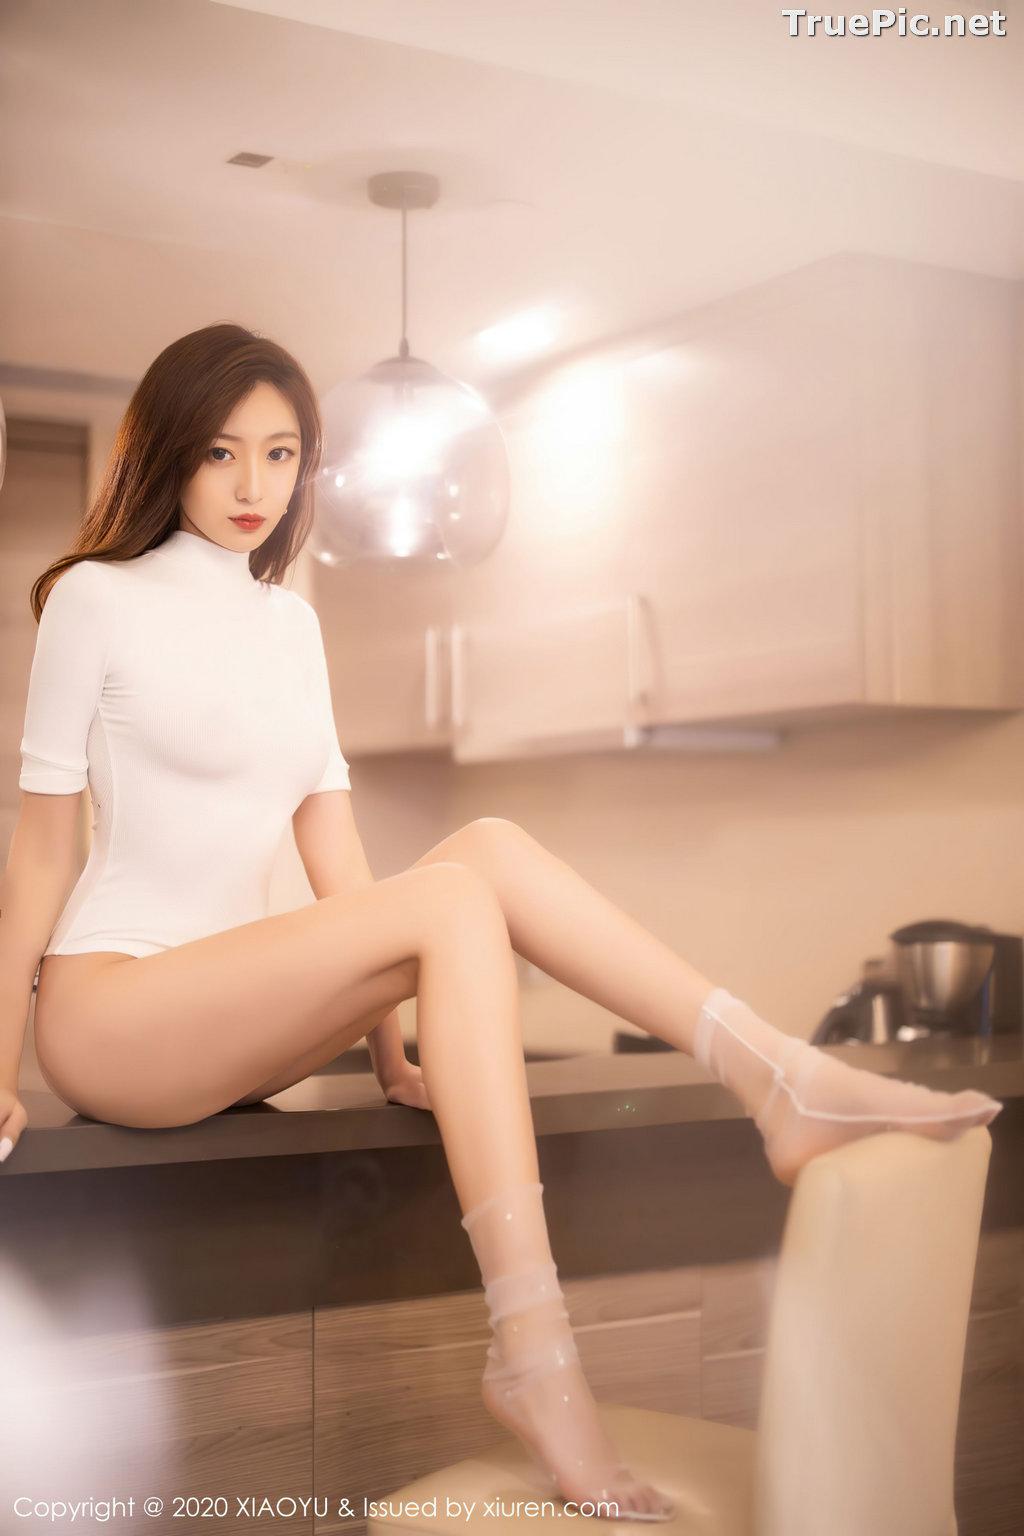 Image XiaoYu Vol.389 - Chinese Model - 安琪 Yee - Beautiful In White - TruePic.net - Picture-9